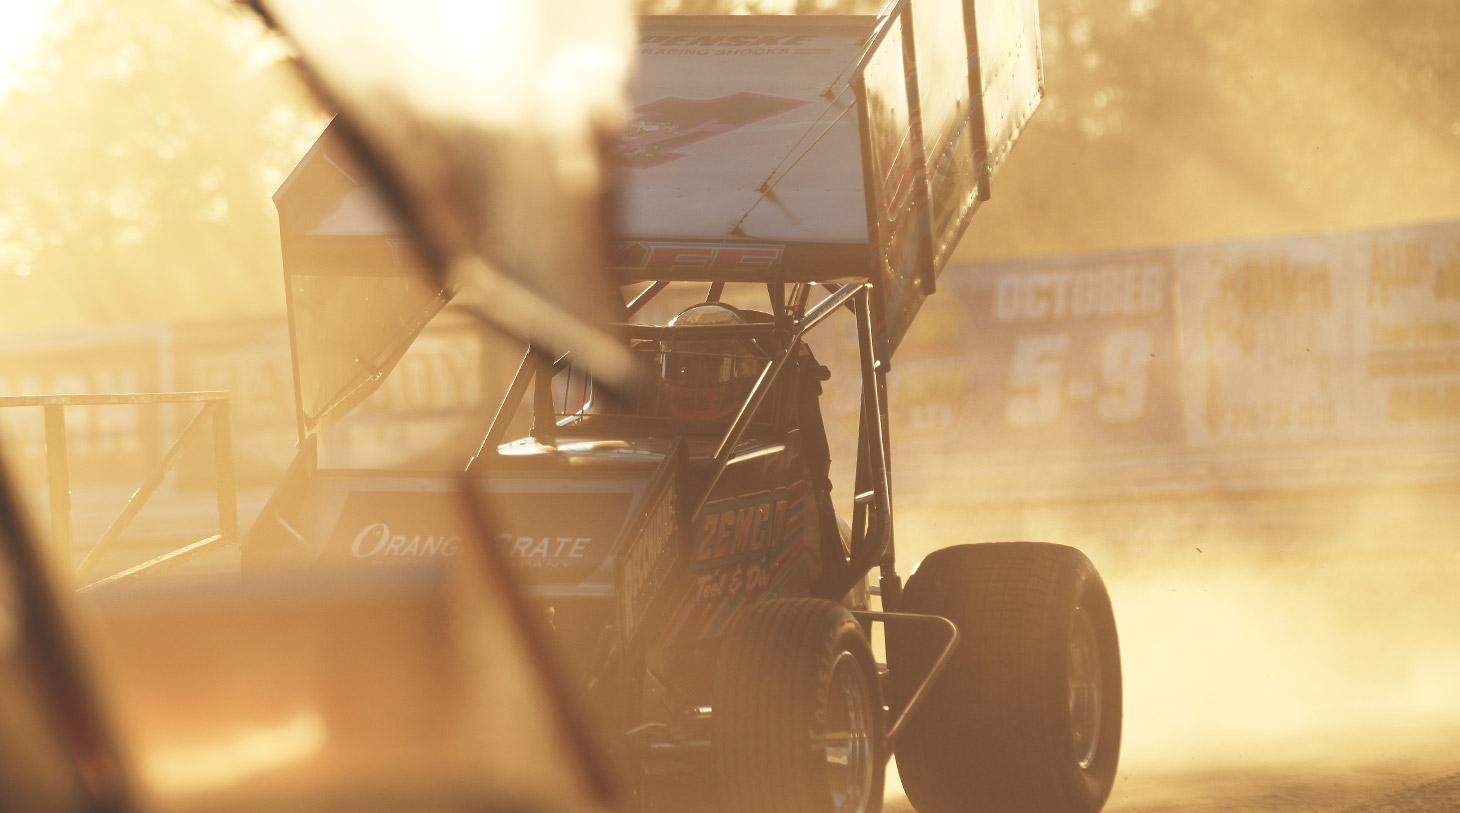 Lucas Wolfe puts heat in the motor at Volusia Speedway in Florida. (Jeffrey Turford / TDP)